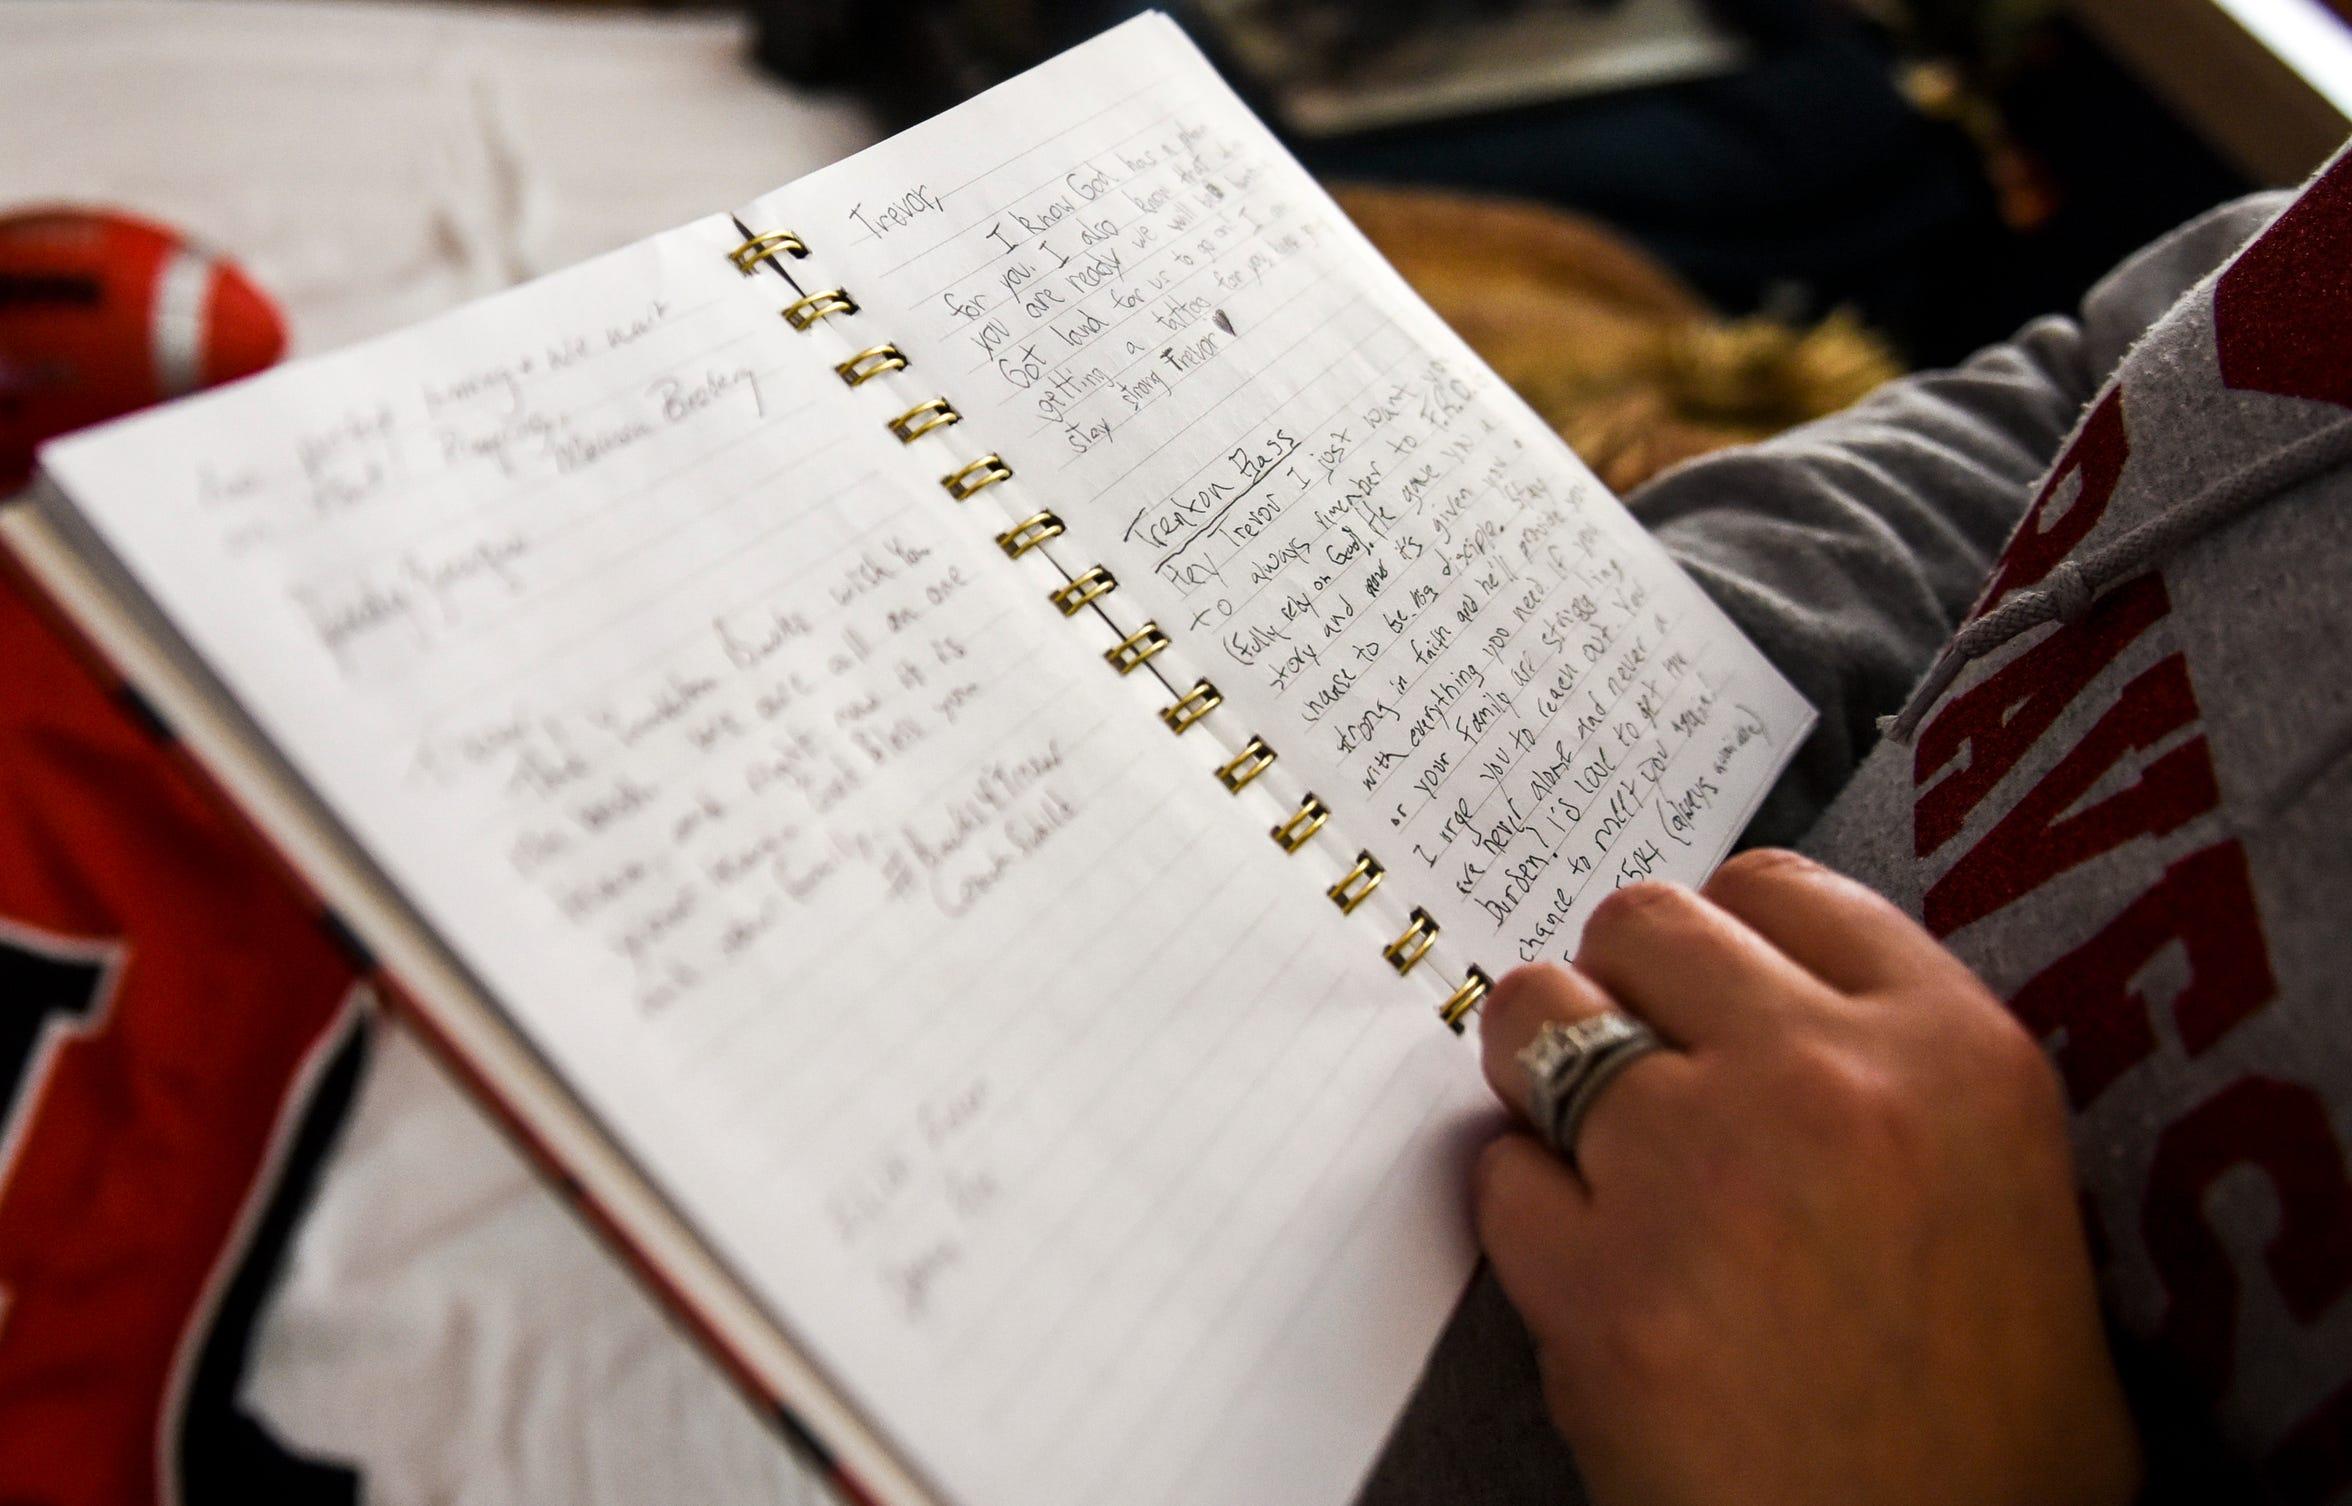 Nikki Stiegelmeier reads notes written to Trevor Zuehlke on Tuesday, Nov. 12, 2019 at Avera Health.